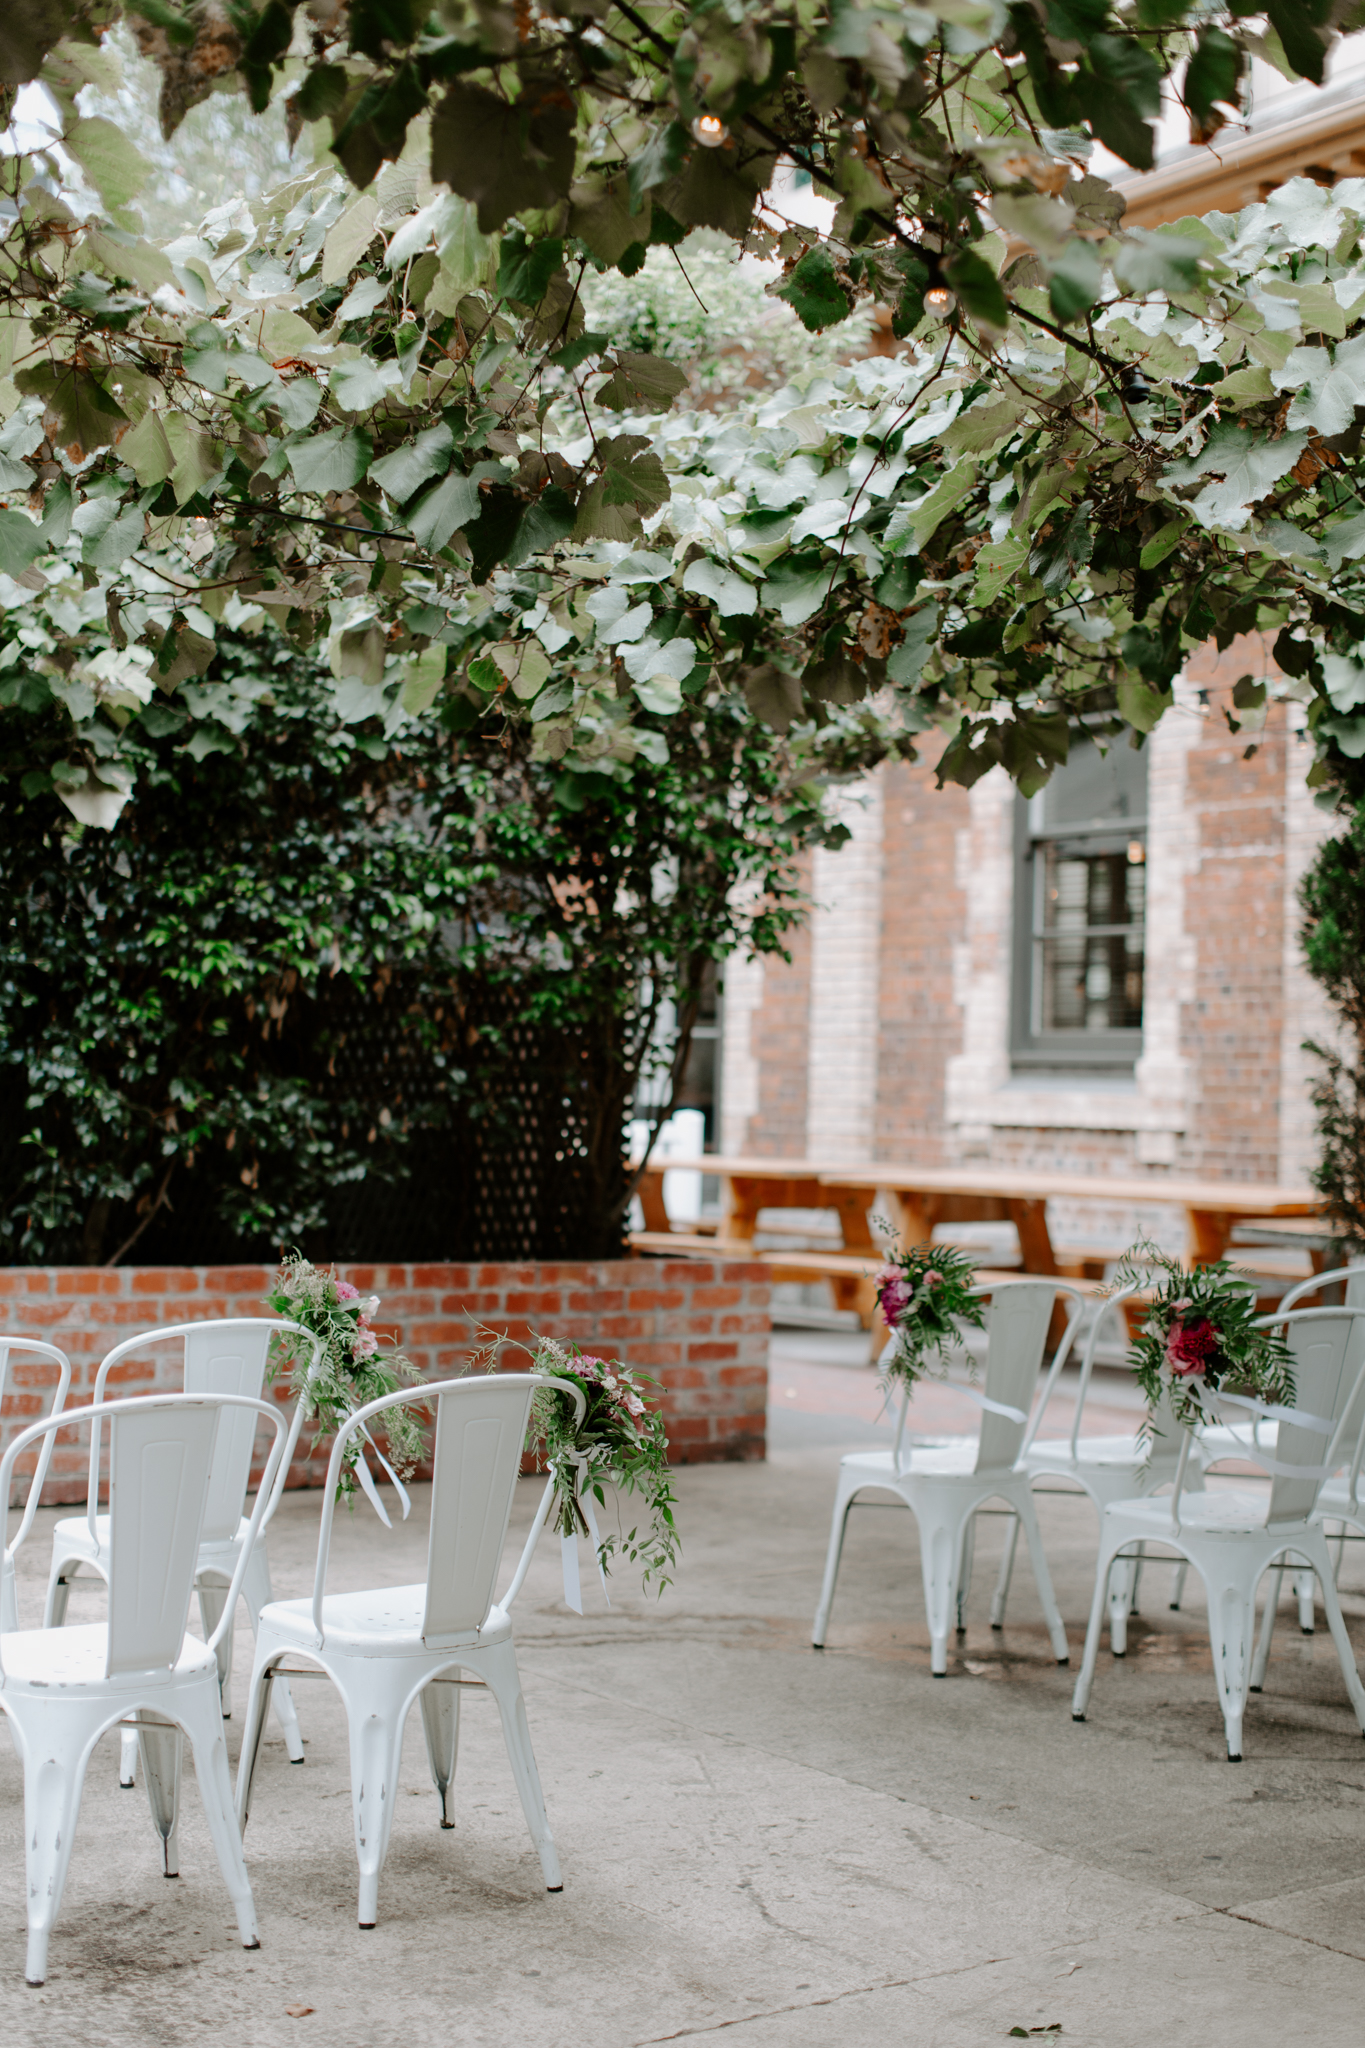 Trunk-restaurant-wedding-EmotionsandMath-002.jpg